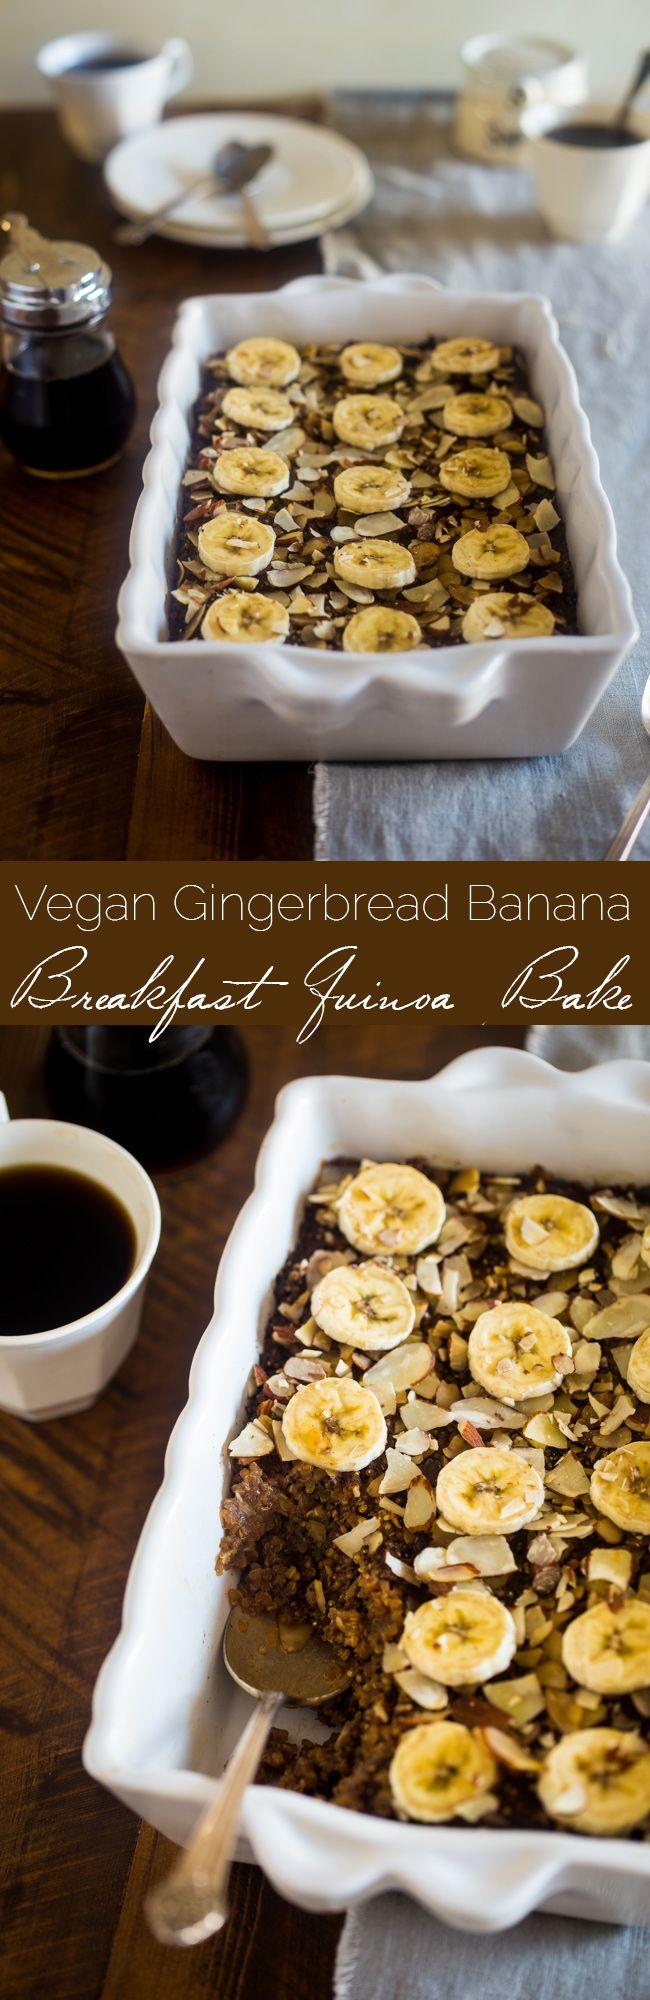 Vegan Gingerbread Banana Breakfast Quinoa Bake - Quinoa is mixed with molasses…